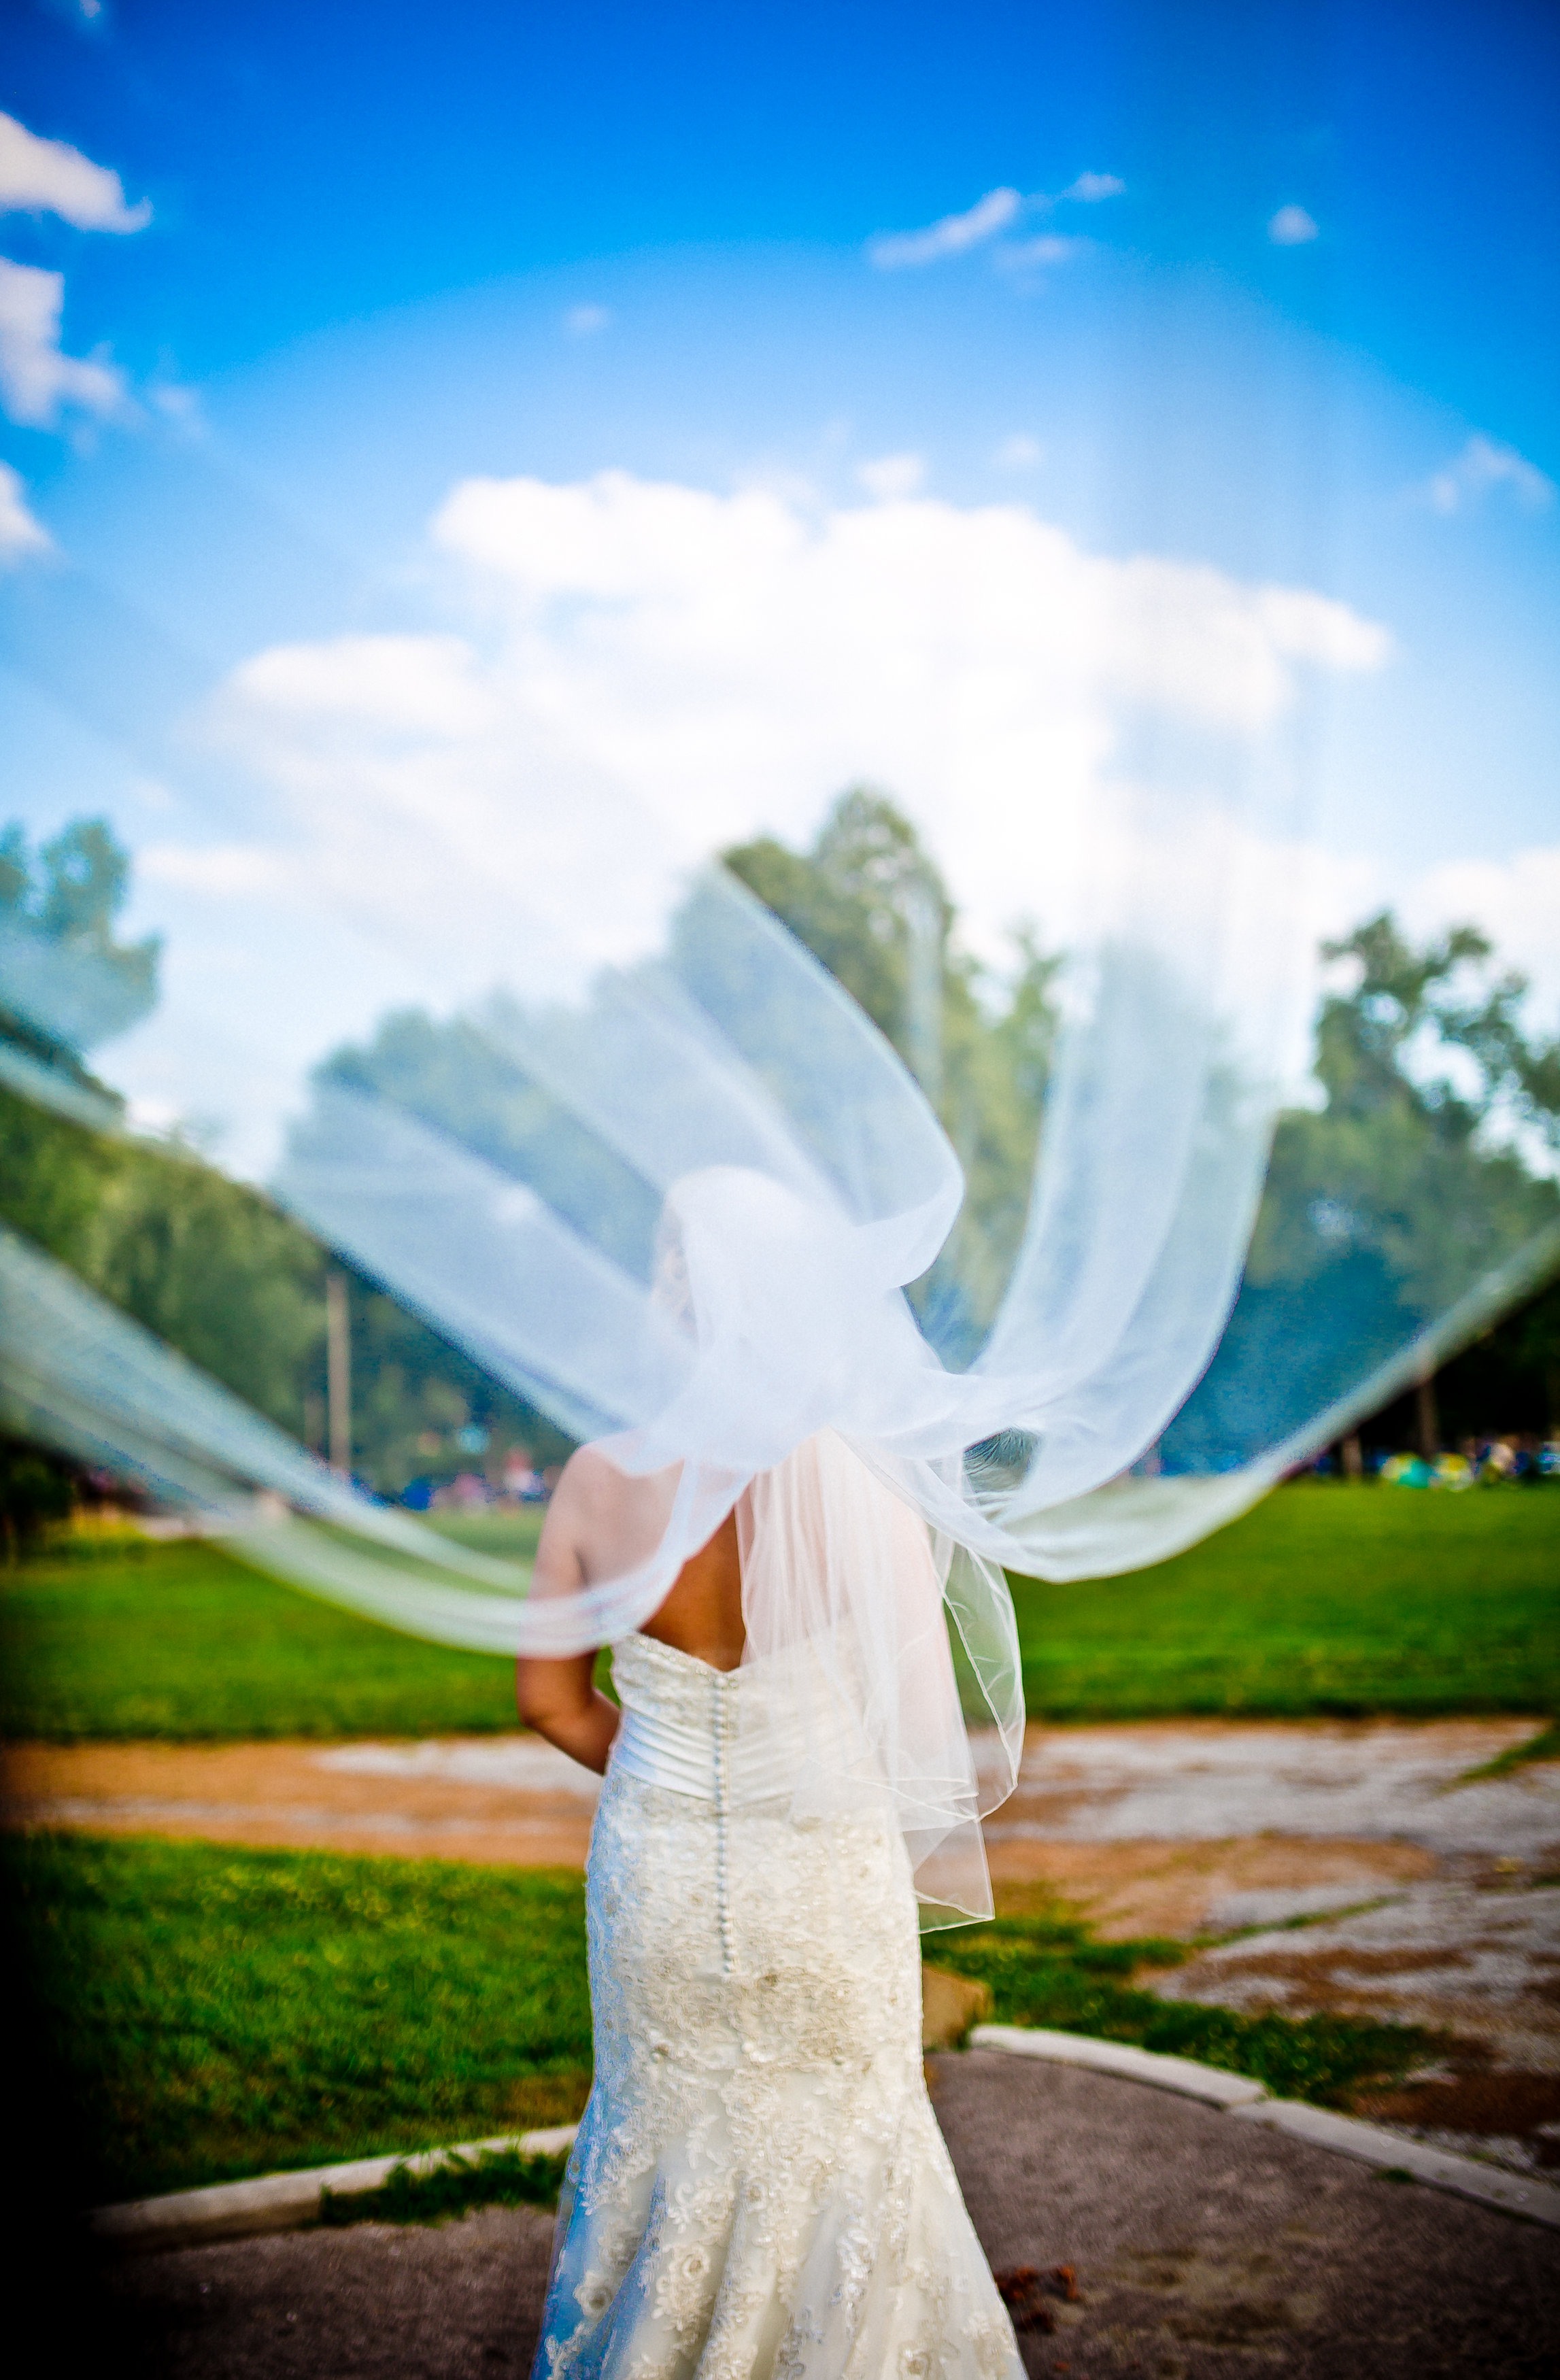 melandjiim-Wedding 2-0461.jpg